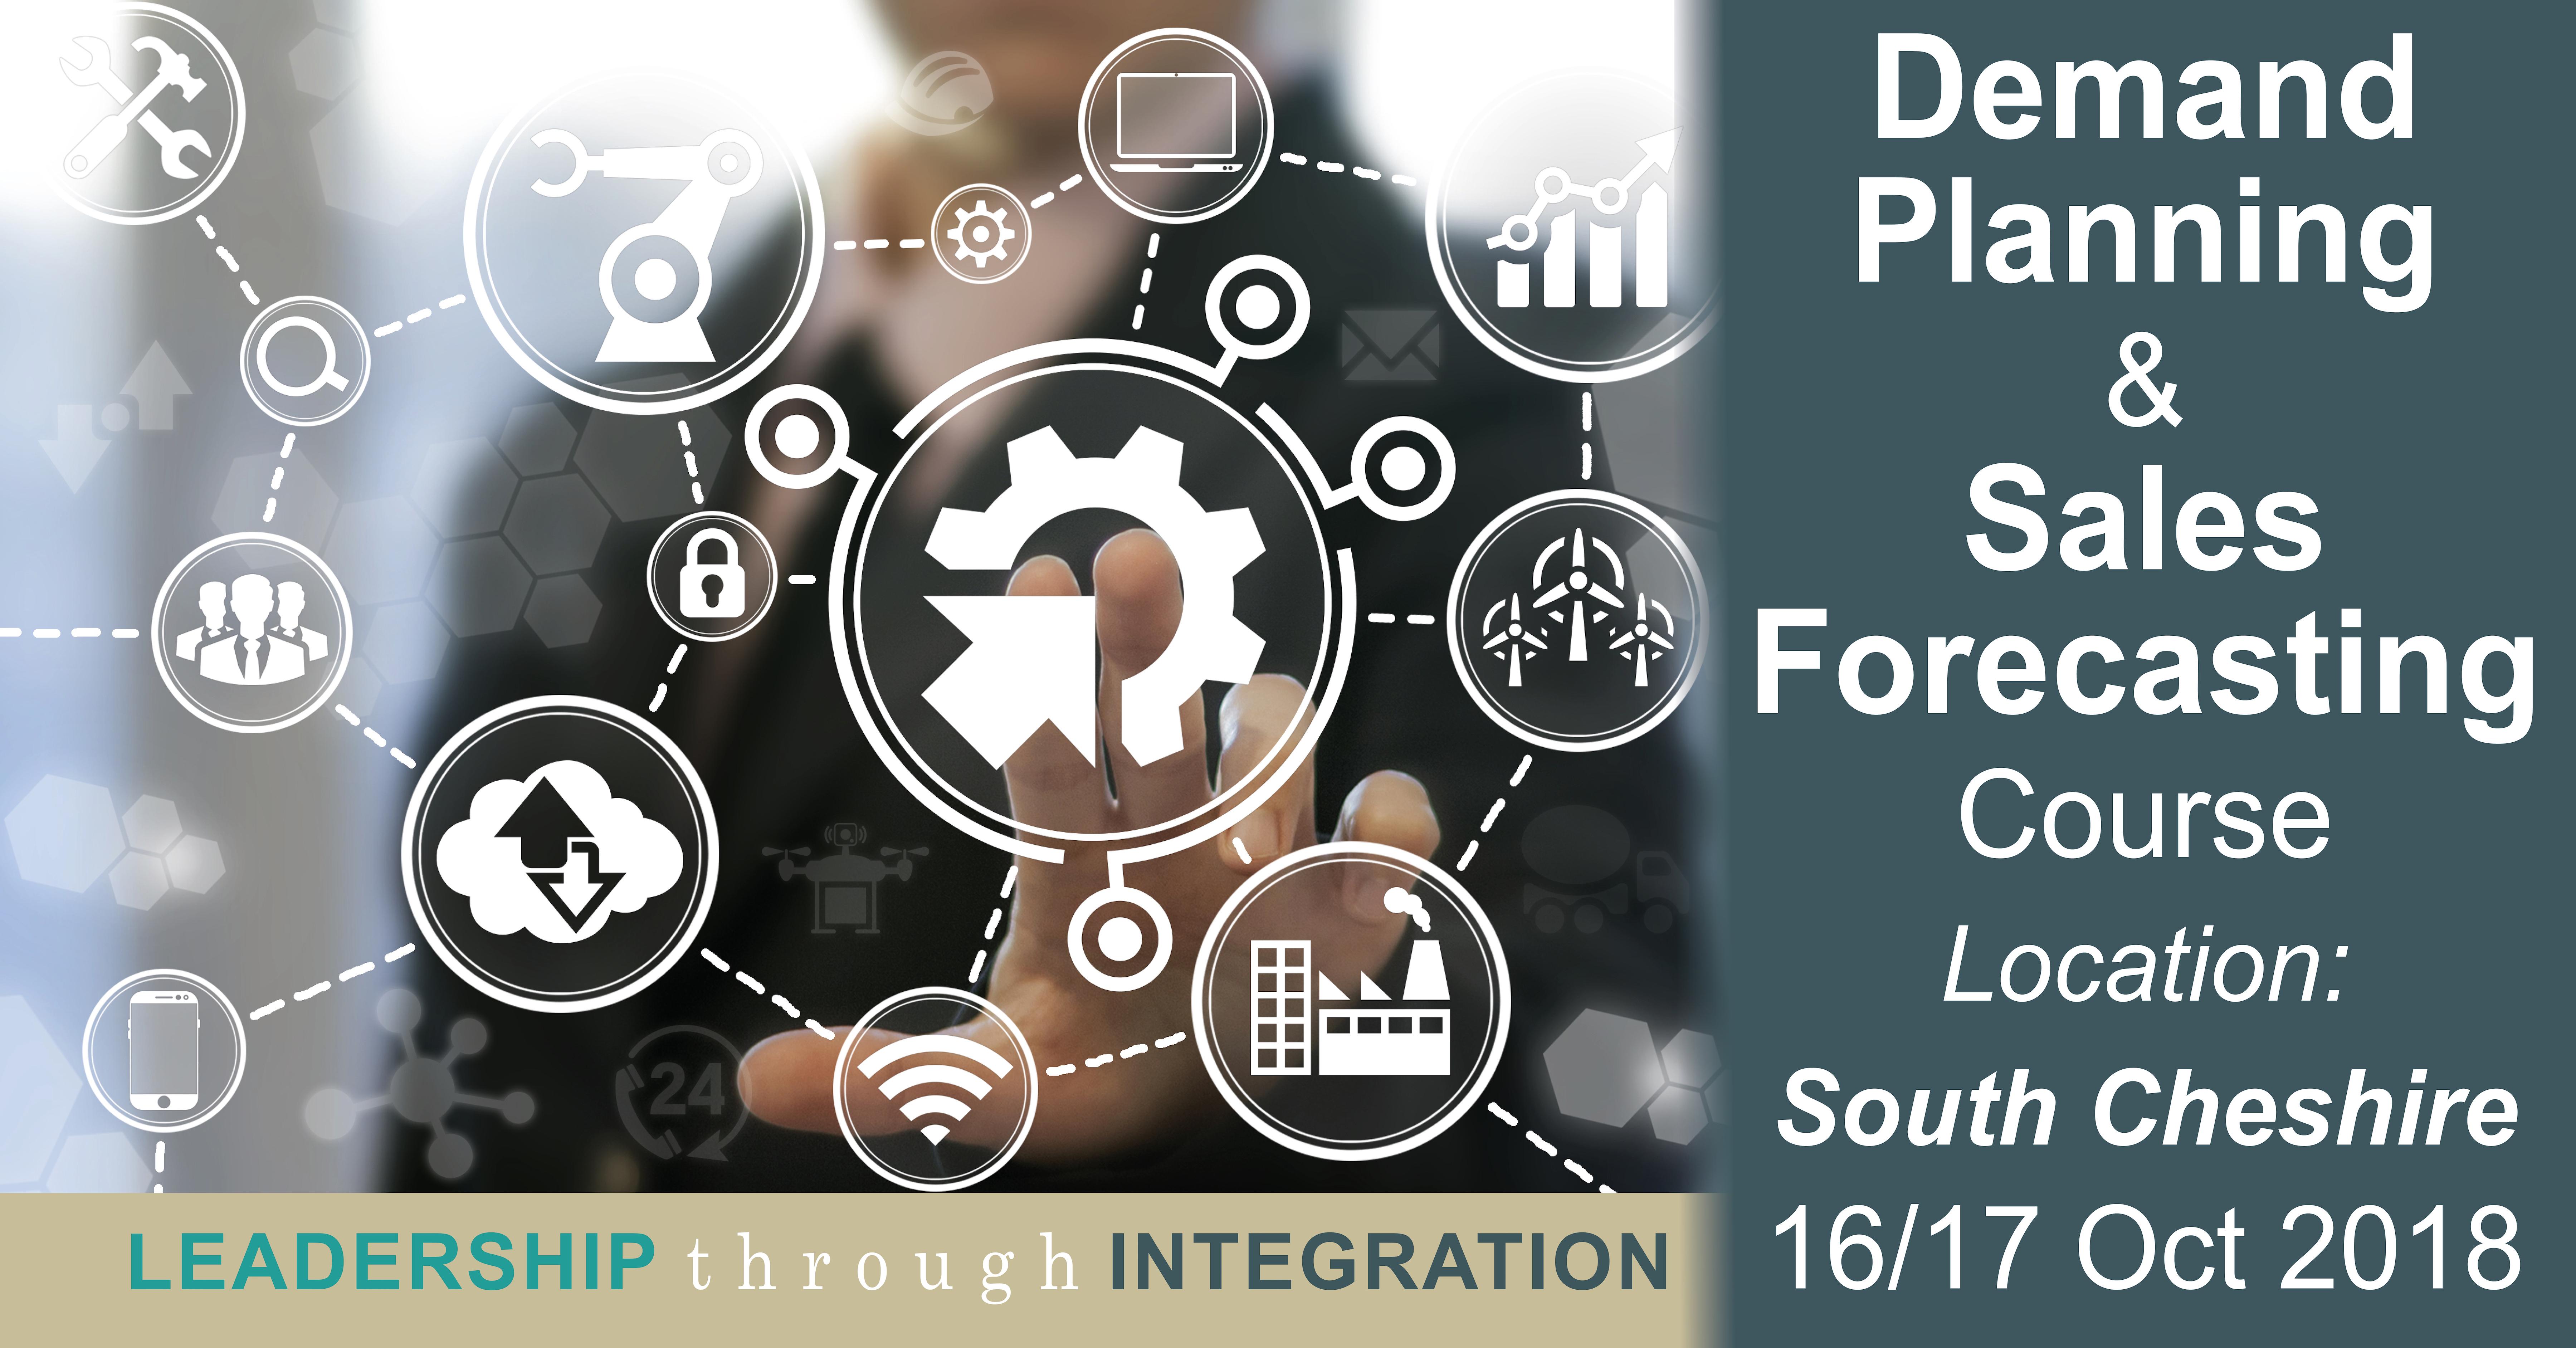 Business Transformation: DMi - LEADERSHIP through INTEGRATION